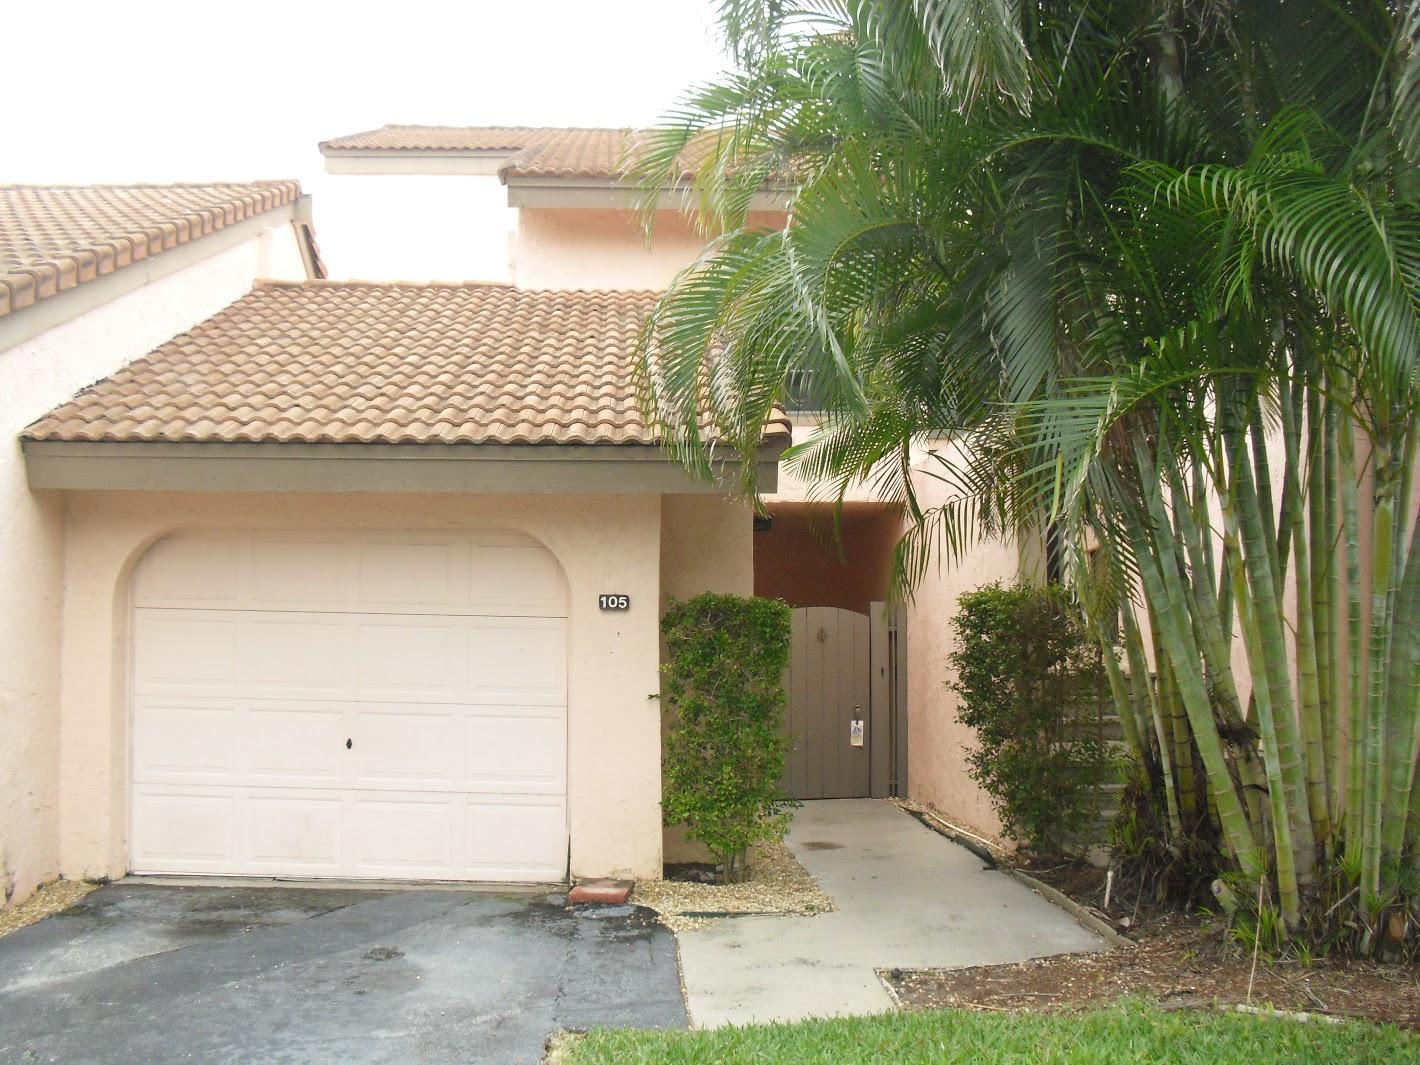 1800 Embassy Drive 105 West Palm Beach, FL 33401